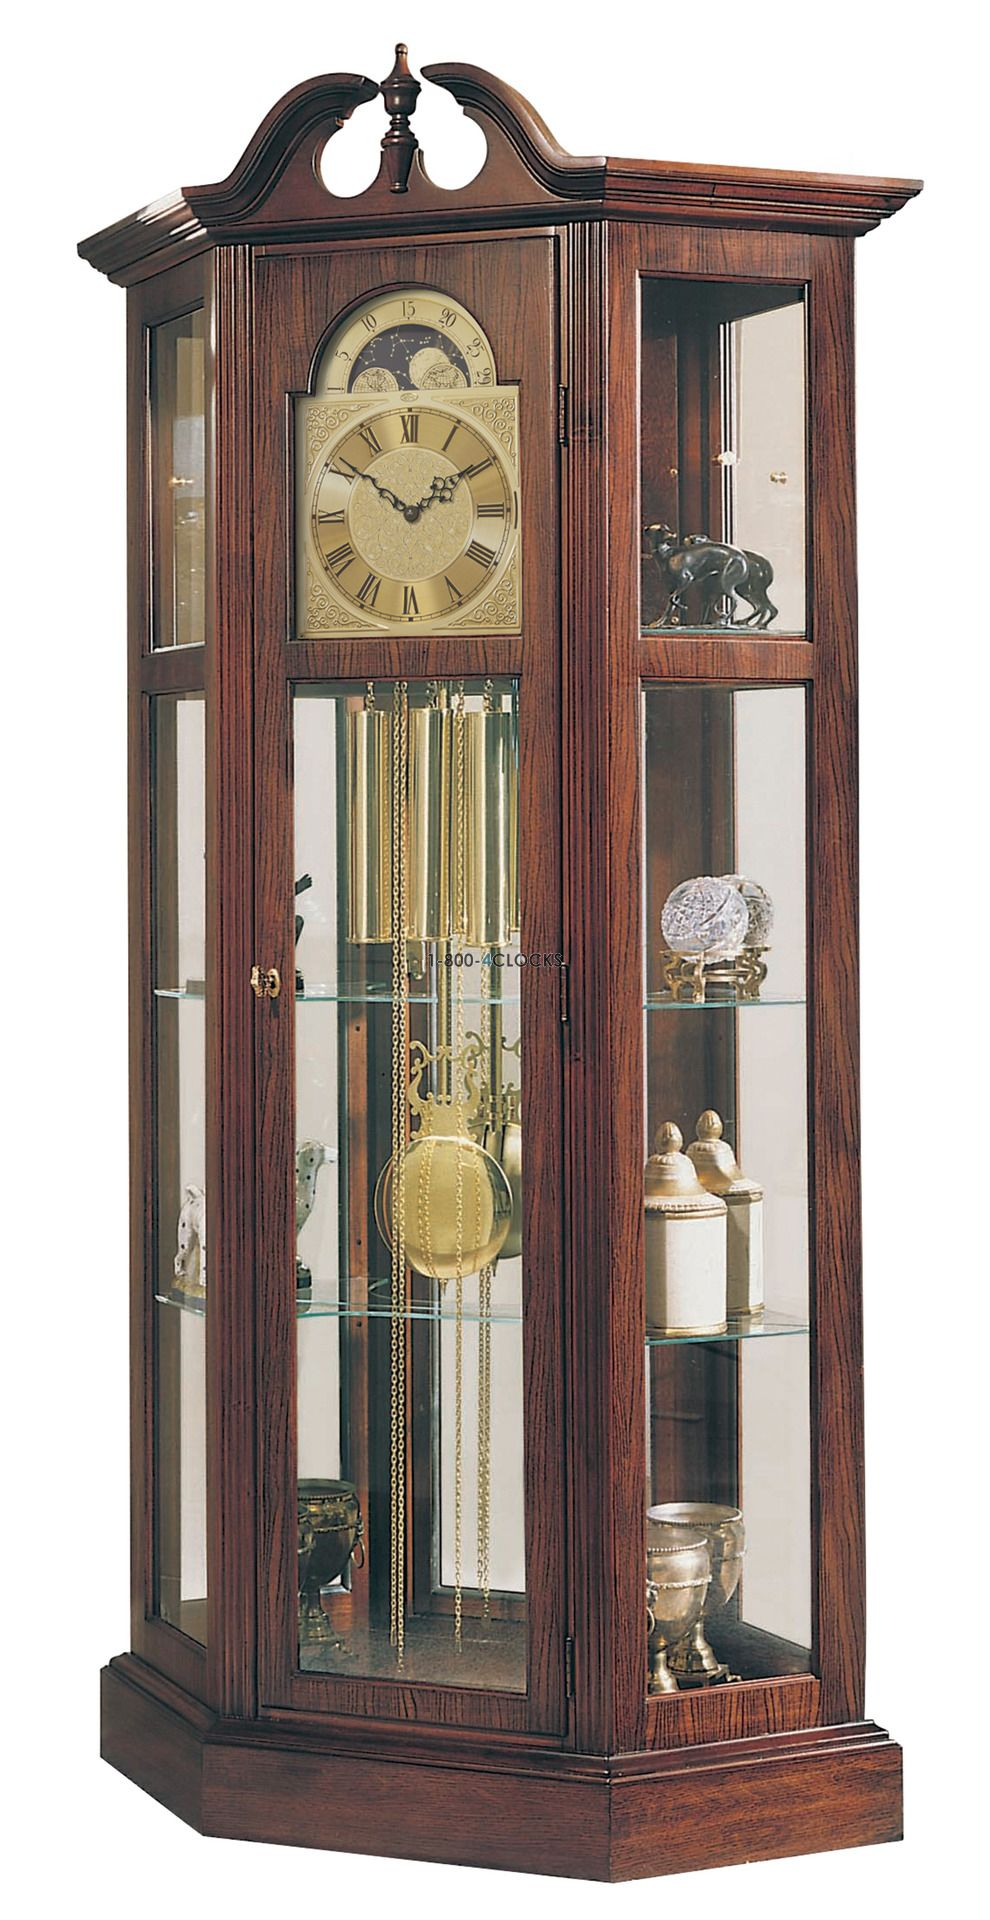 Ridgeway Richardson I Curio Grandfather Clock At 1 800